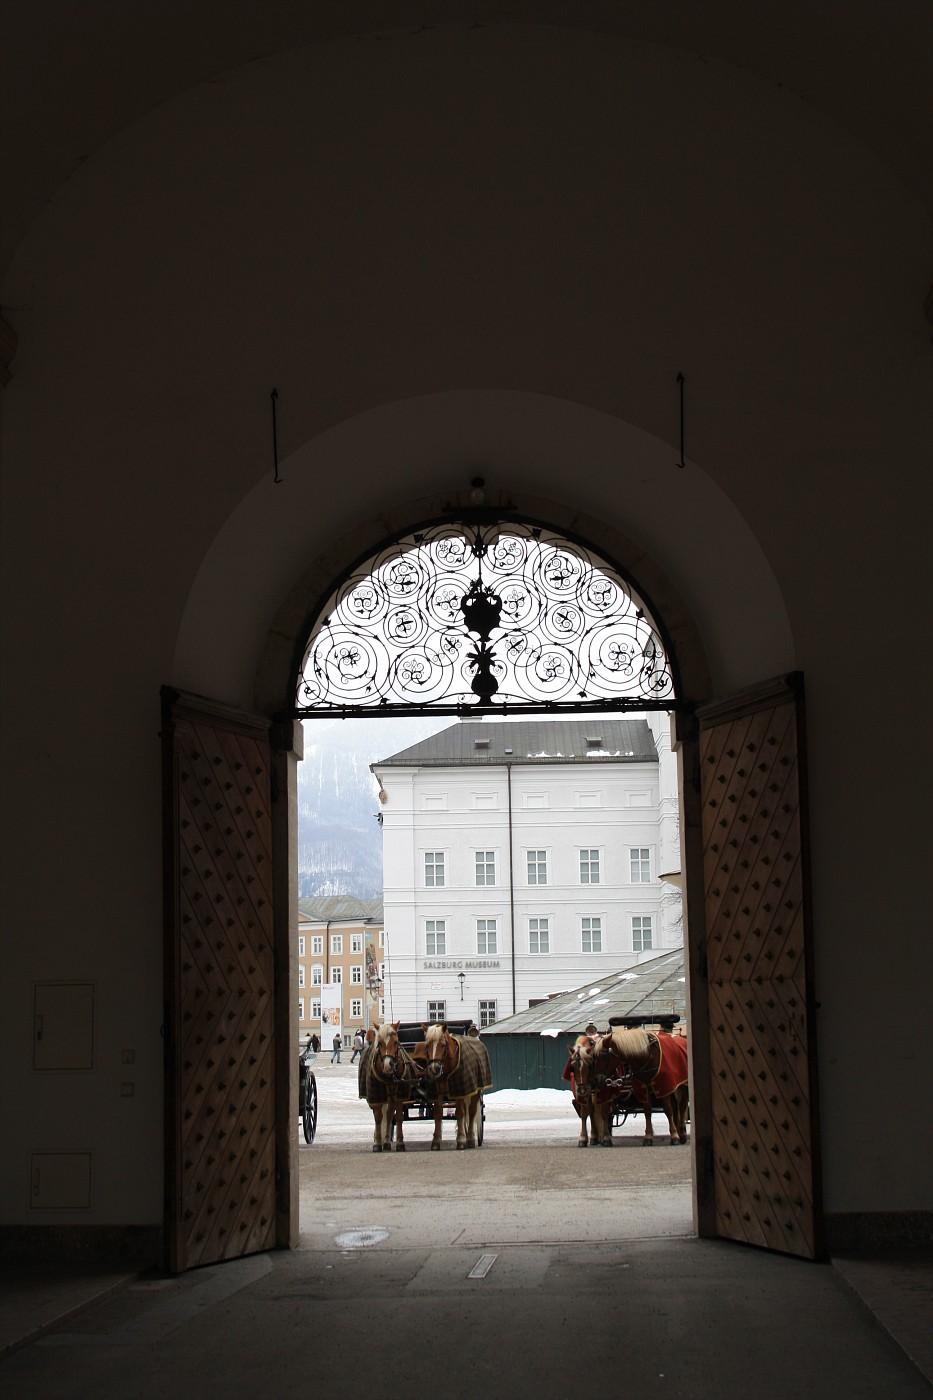 http://images20.fotki.com/v533/photos/2/243162/8488810/Salzburg34-vi.jpg